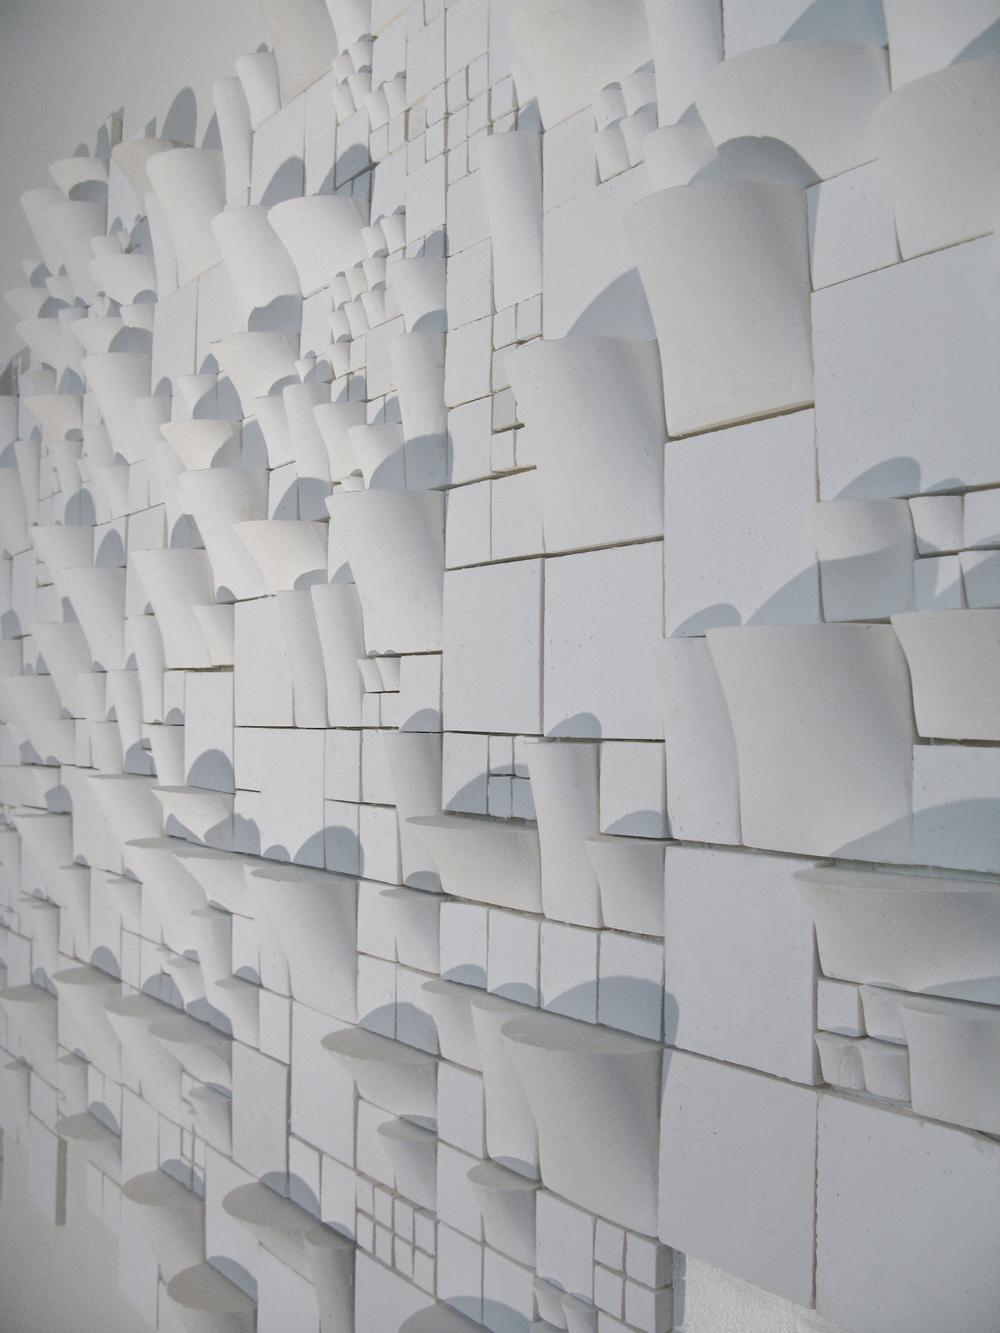 Tiles_Side View.jpg